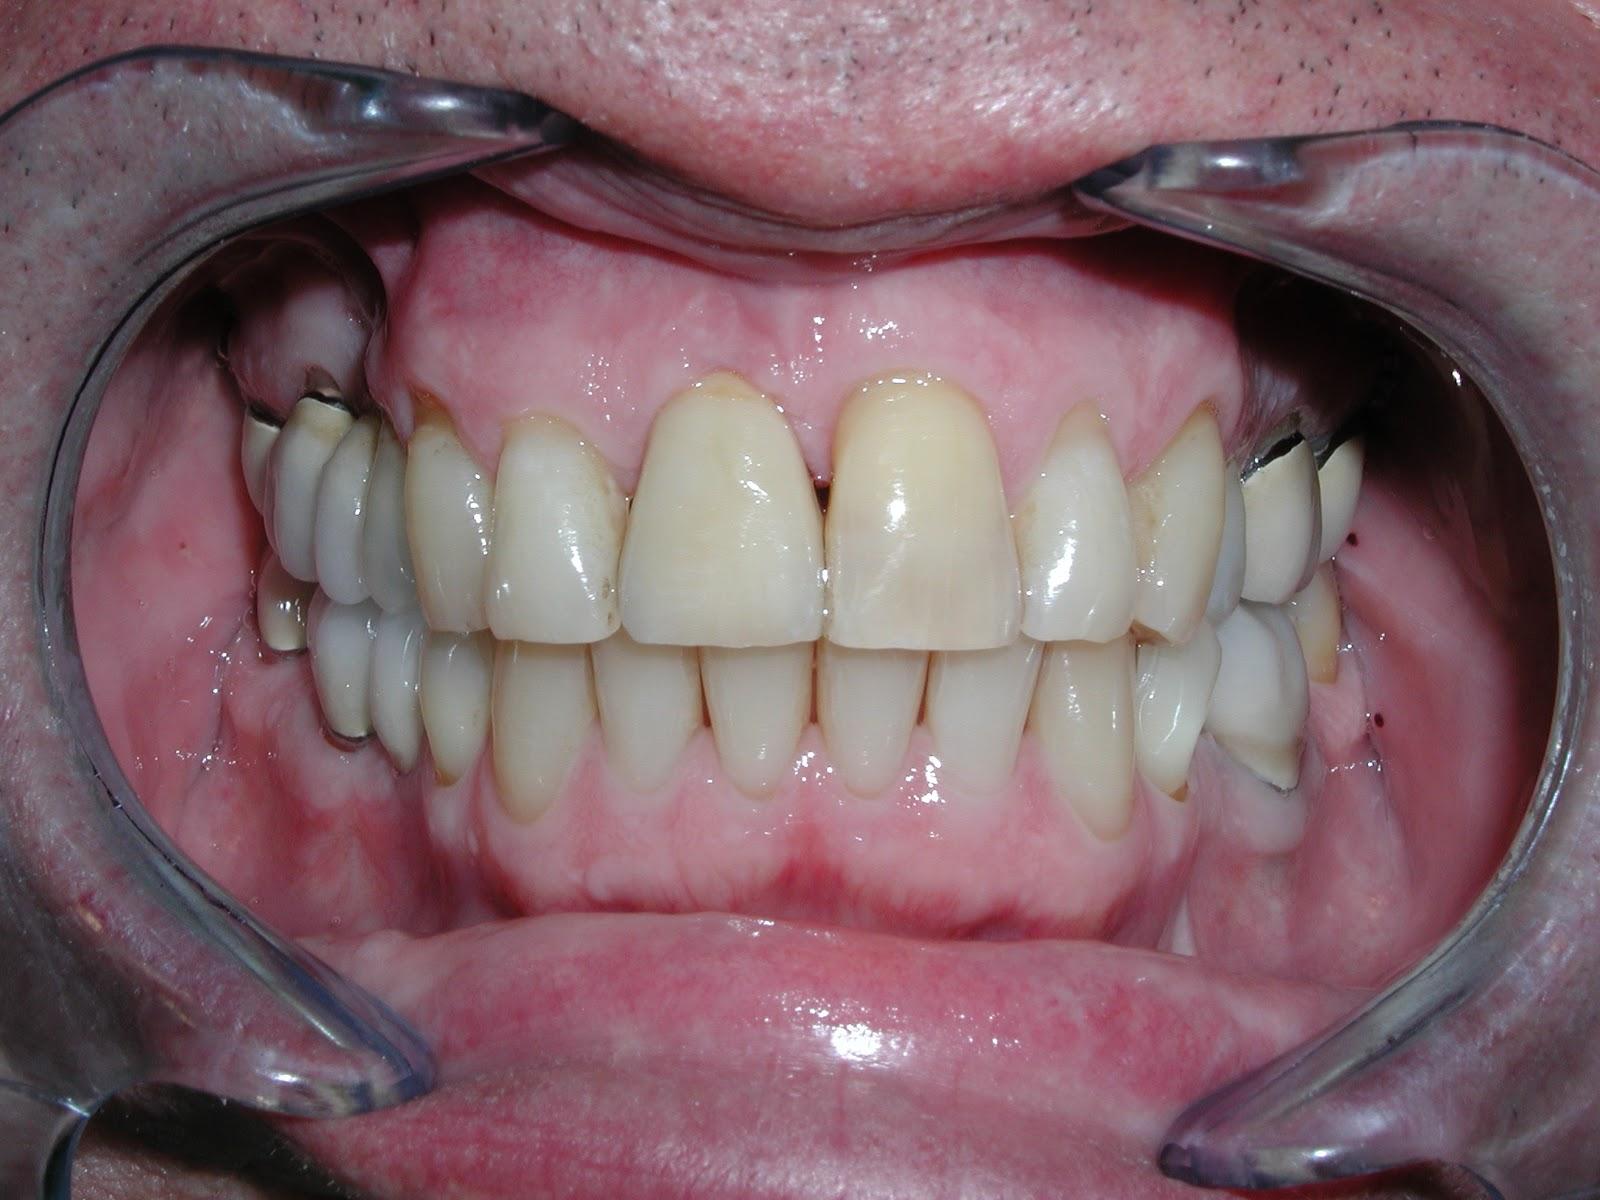 SBO Dental Laboratory: Are Zirconia Crowns Better than PFM?